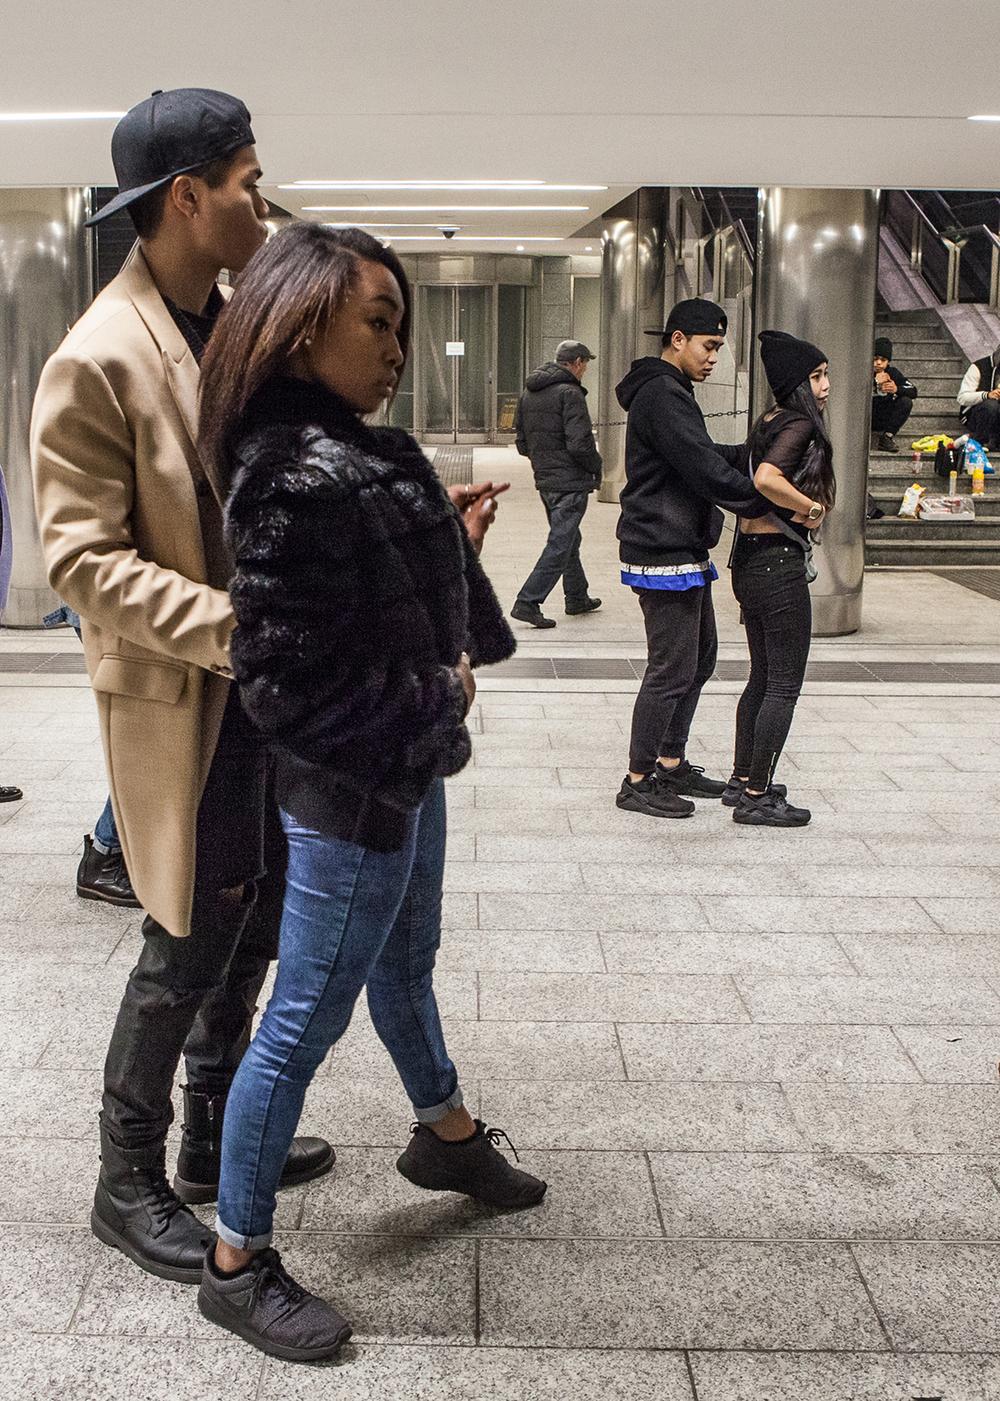 streetdance 05.jpg